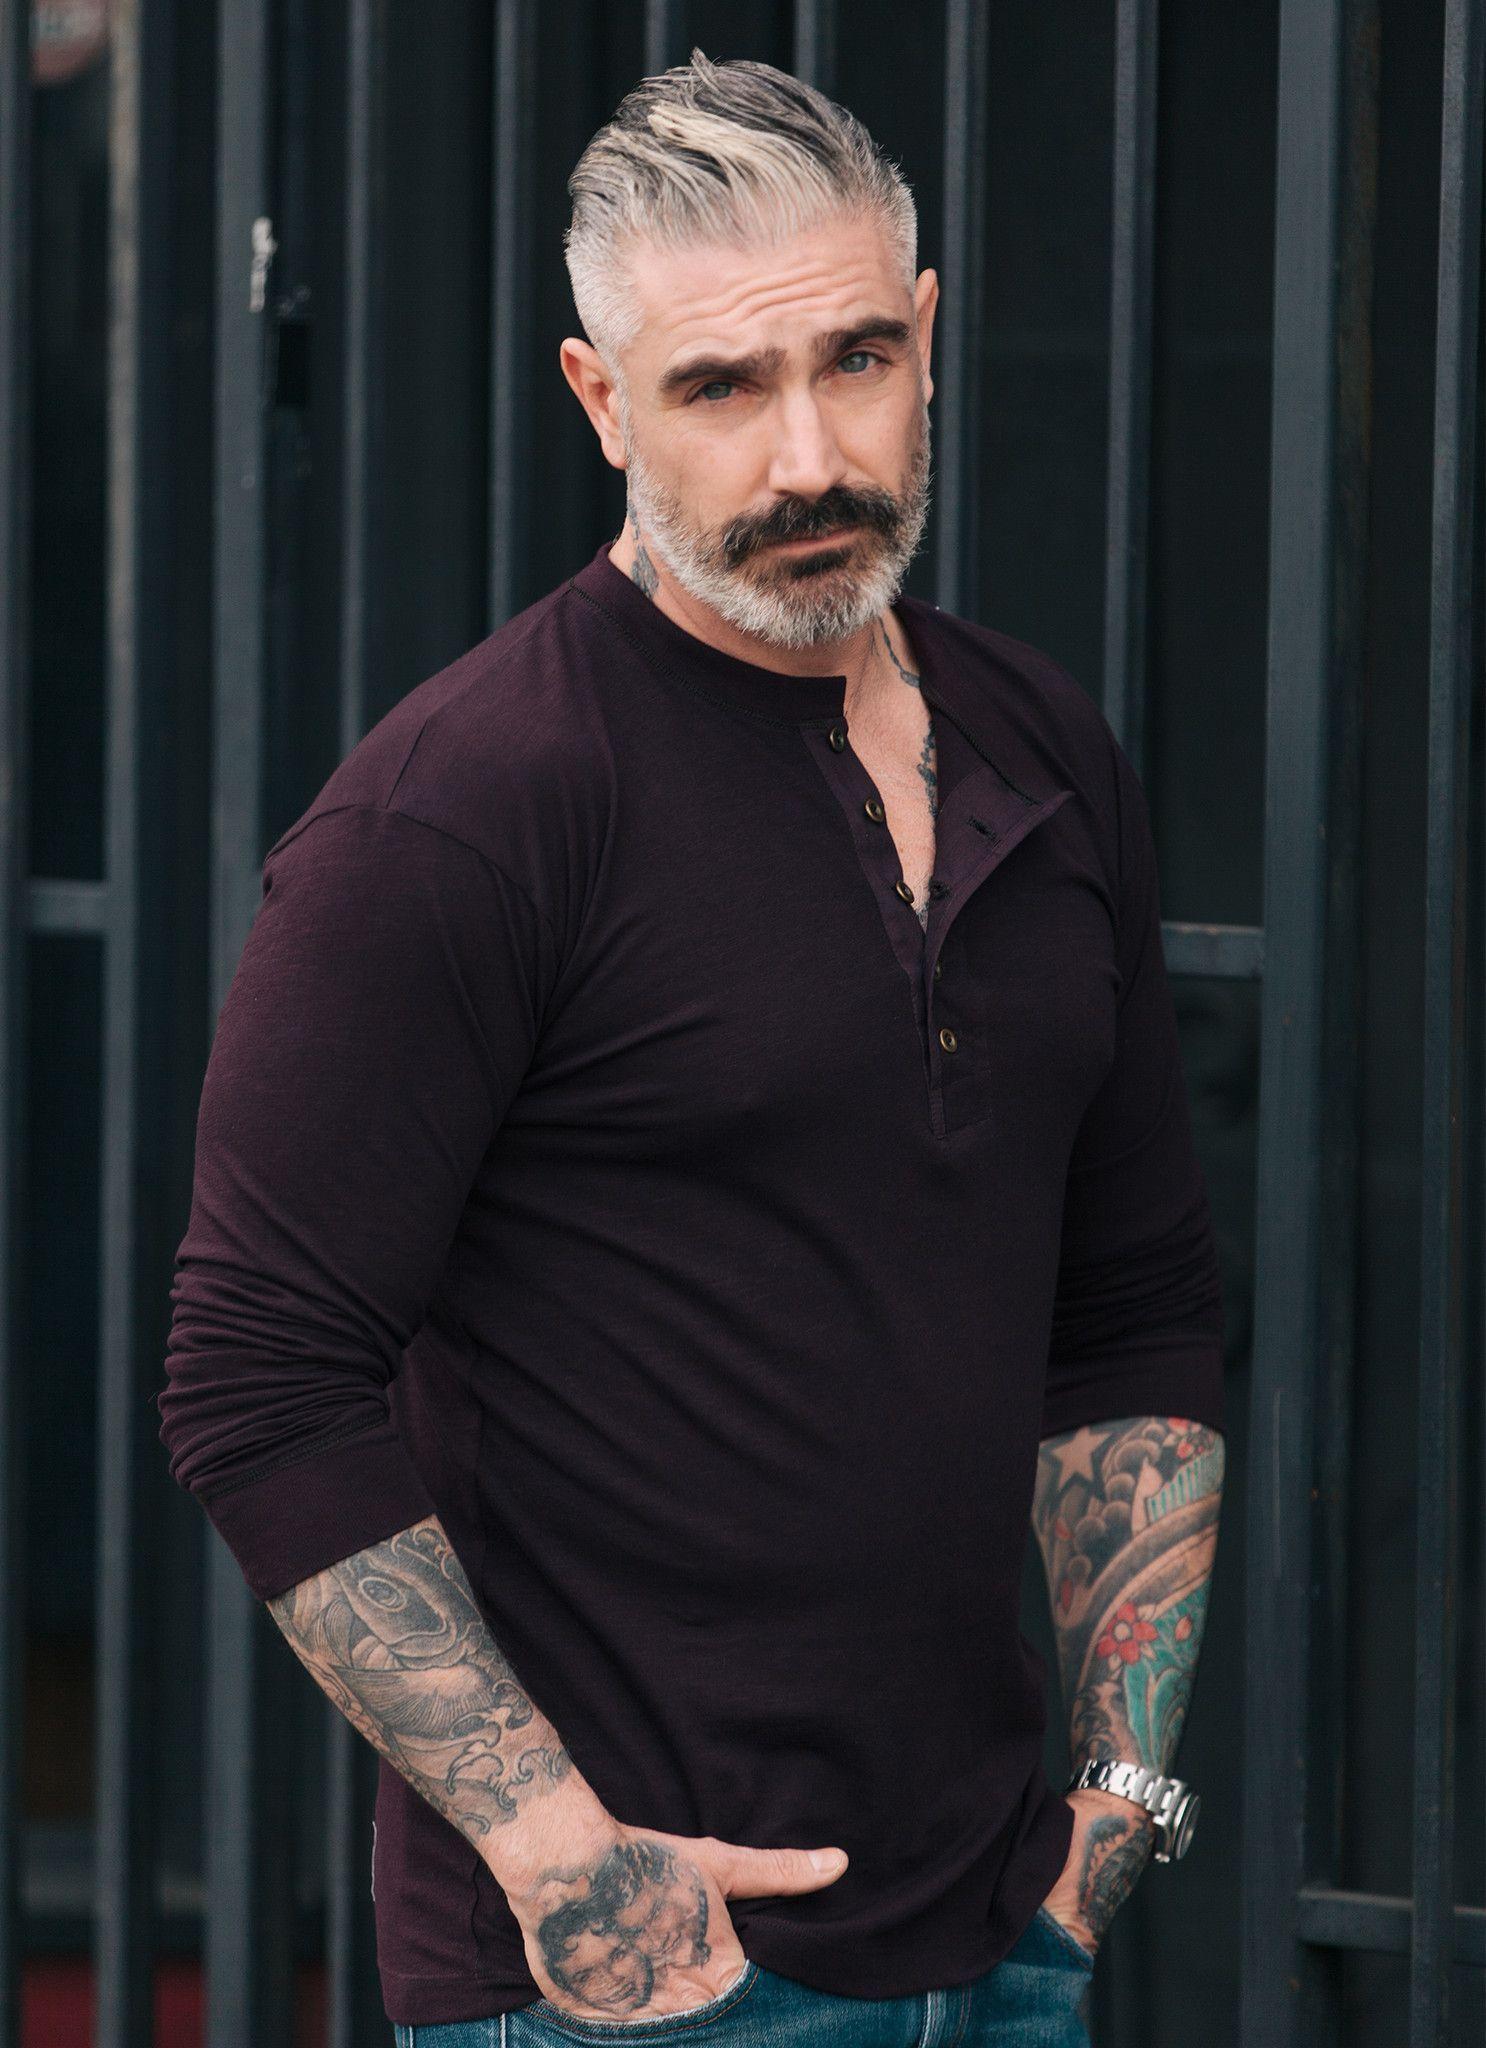 Mens long haircut original long sleeve henley  henleys man style and menus fashion